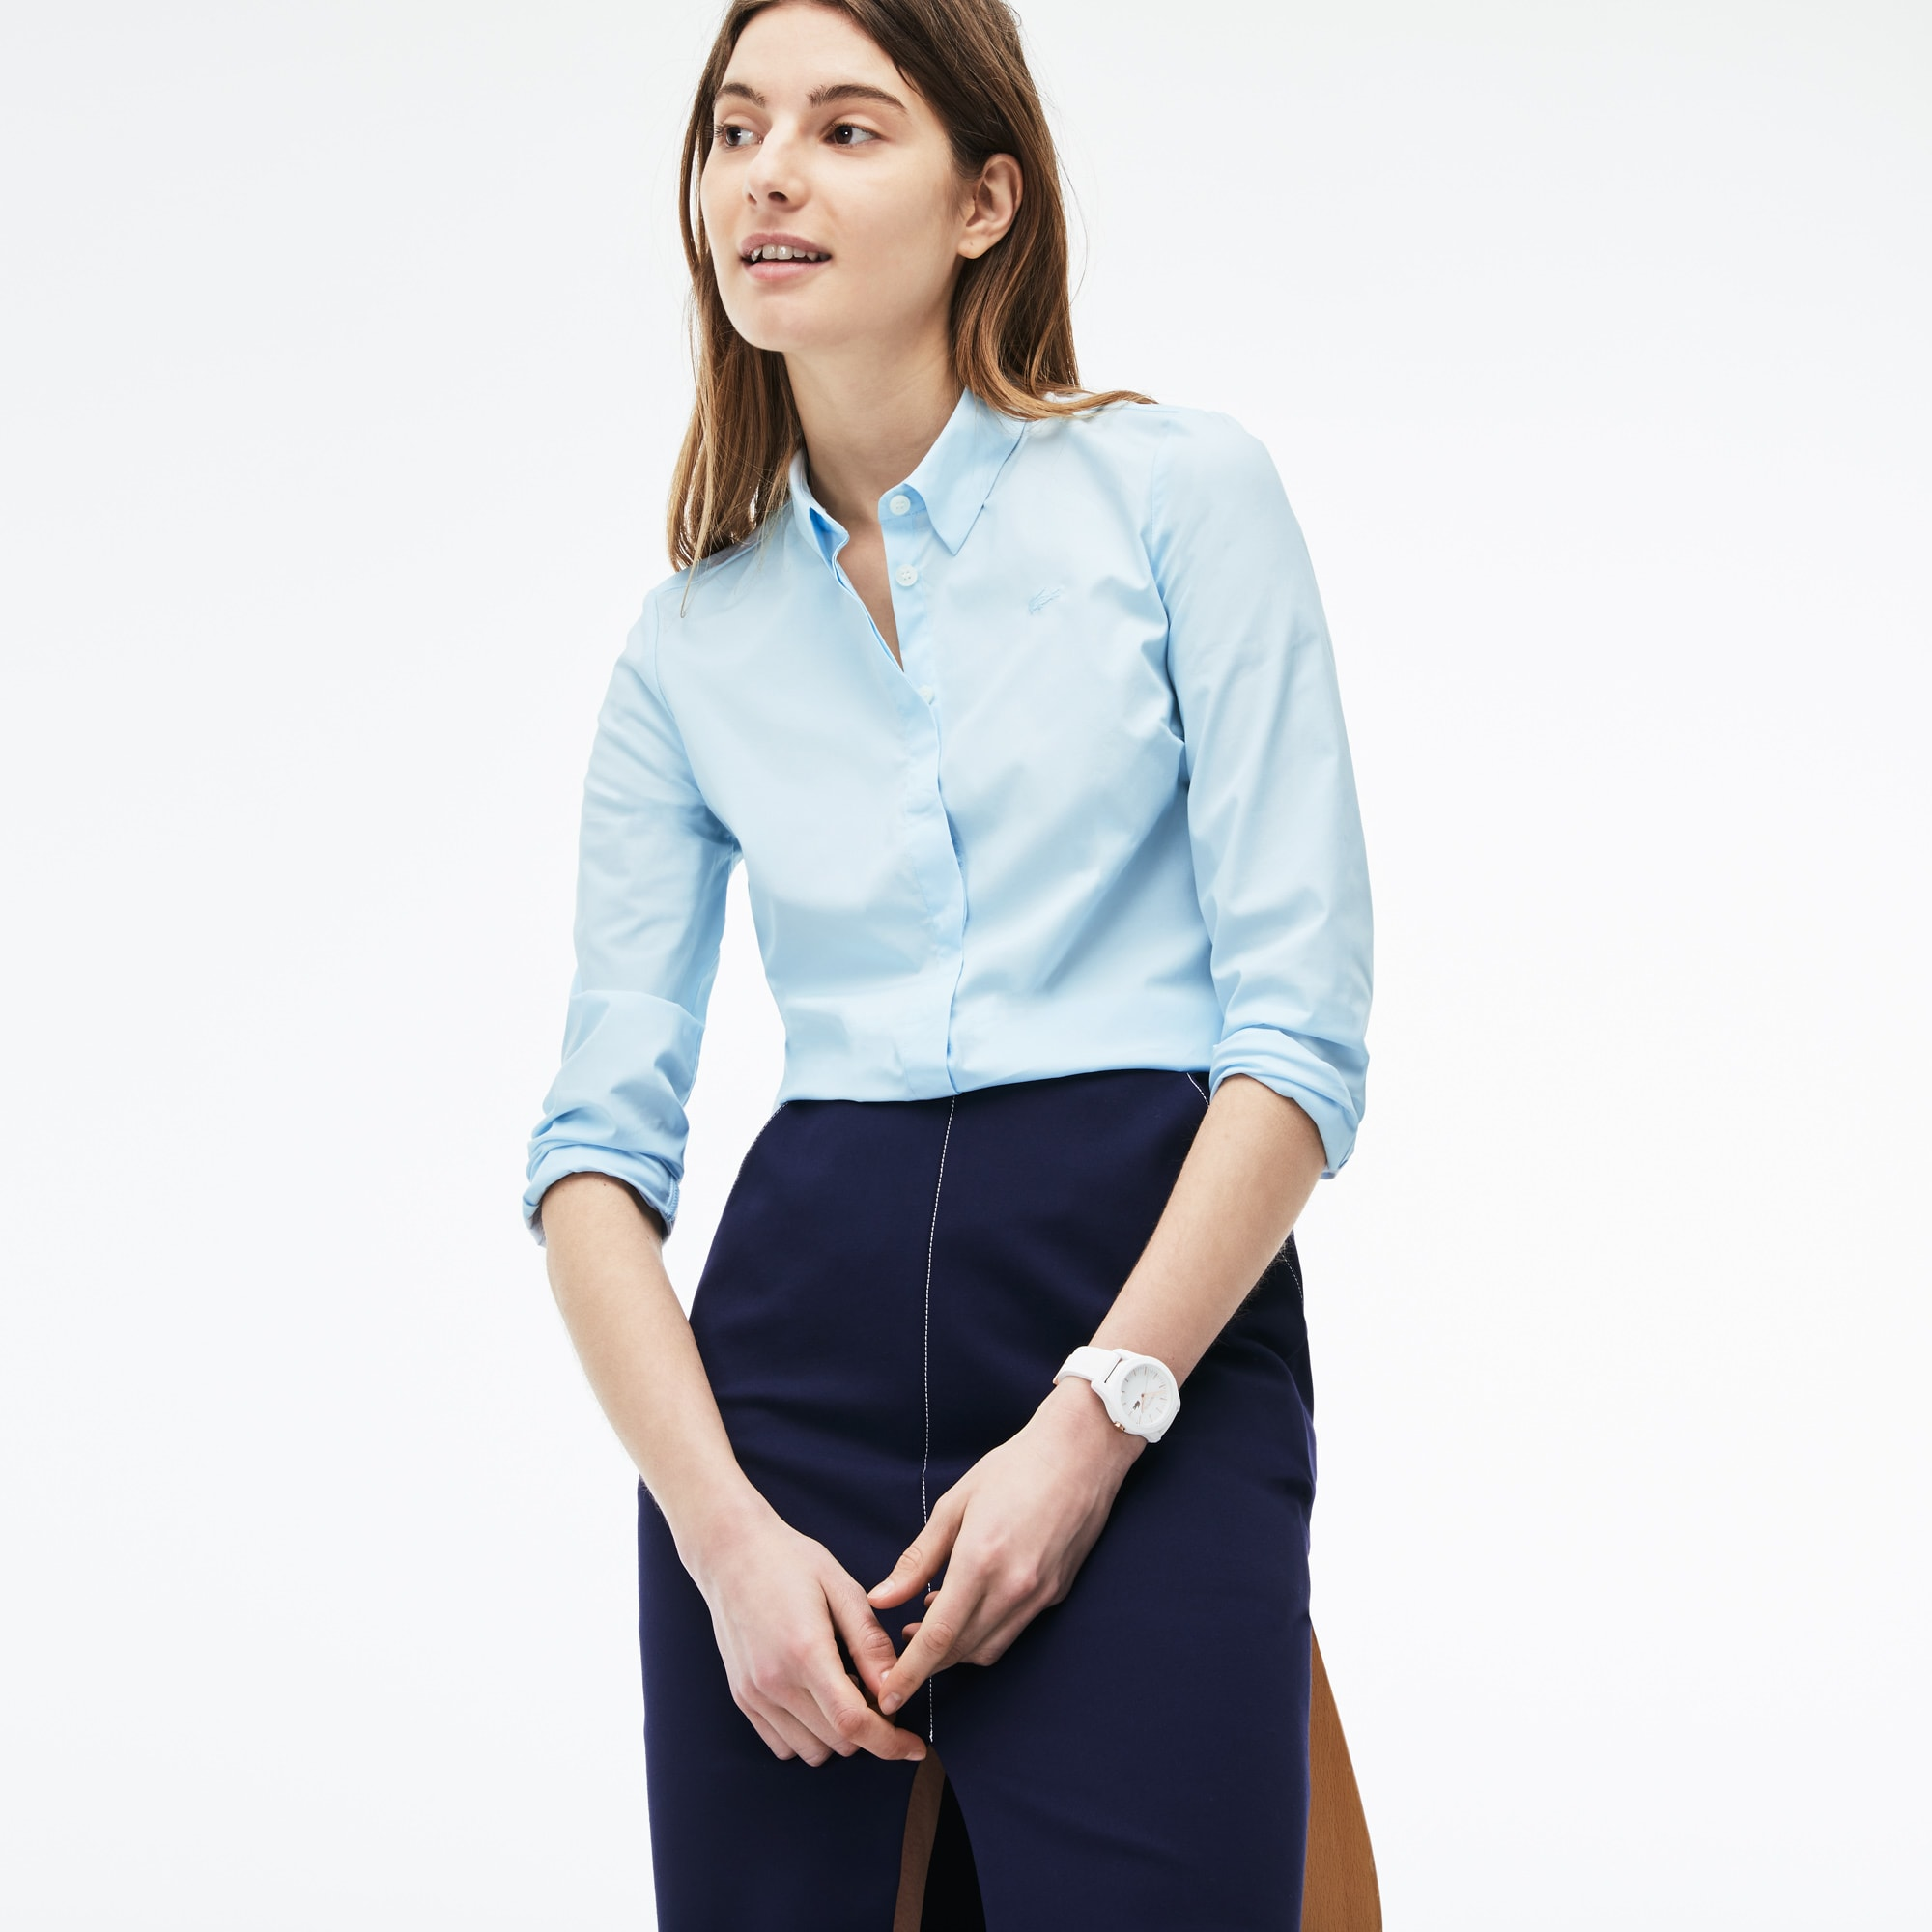 Women's Slim Fit Stretch Shirt